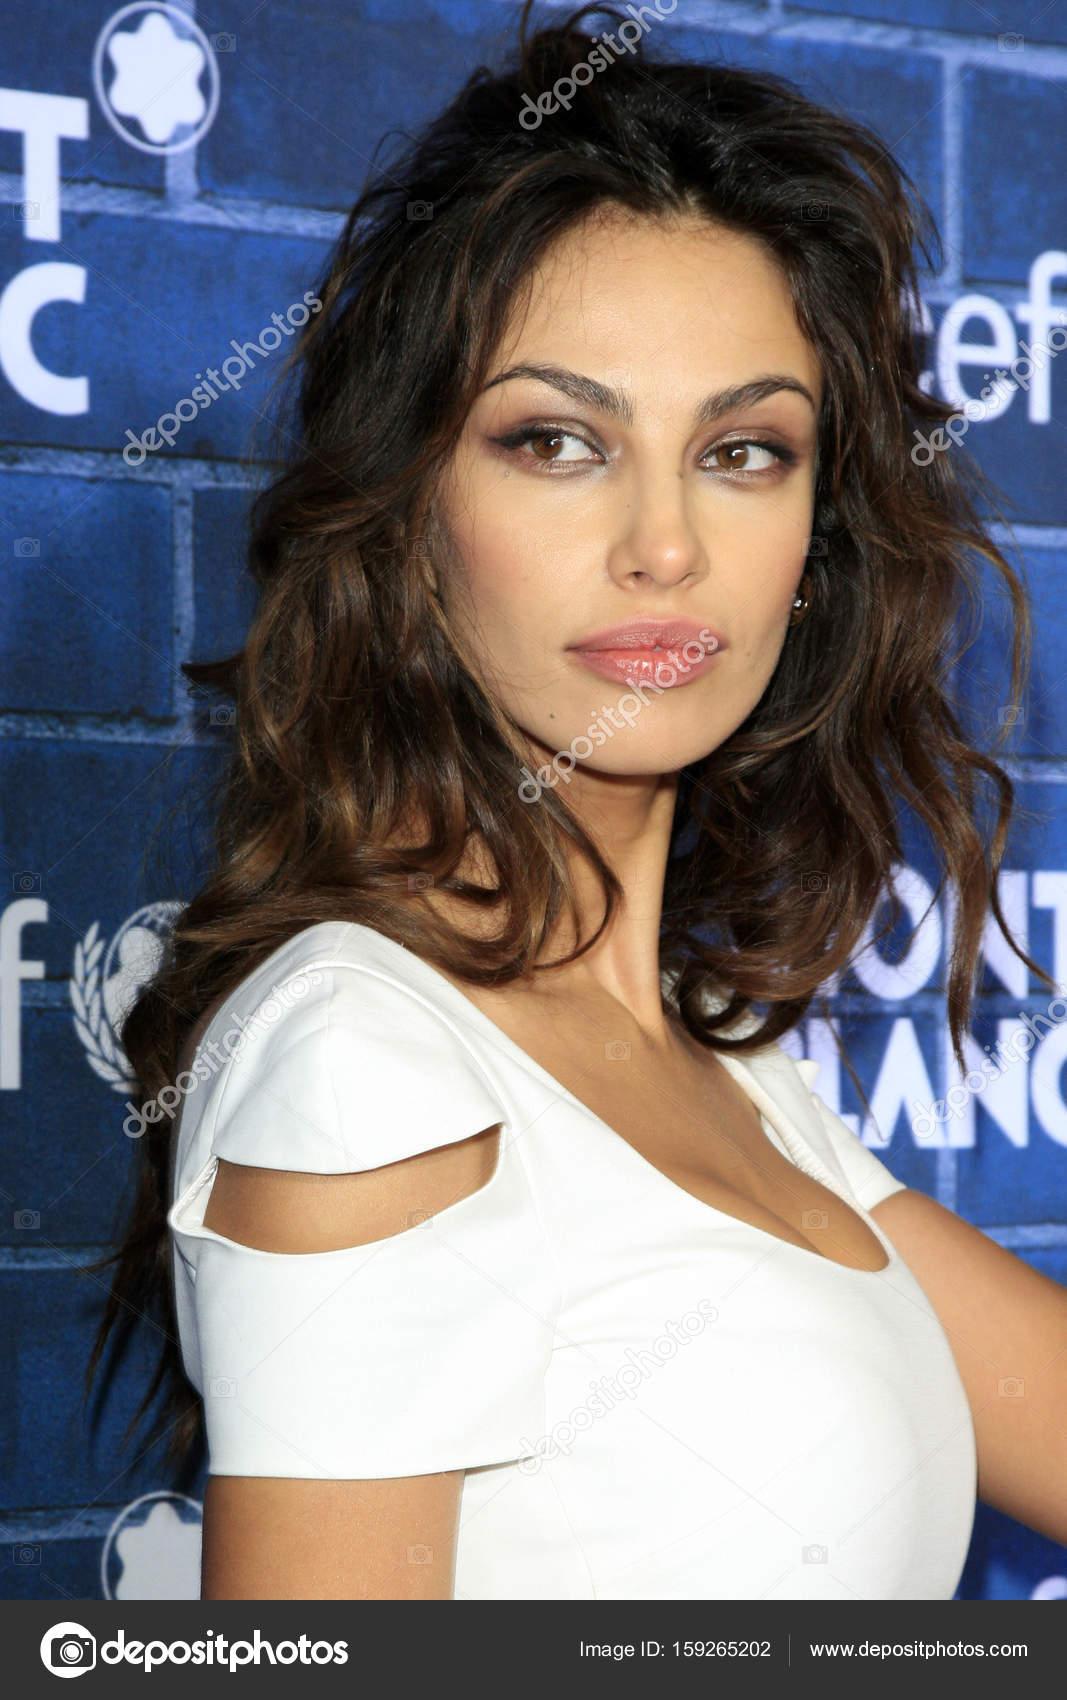 Madalina Genea - biography, photo, age, height, personal ...  |Madalina Ghenea